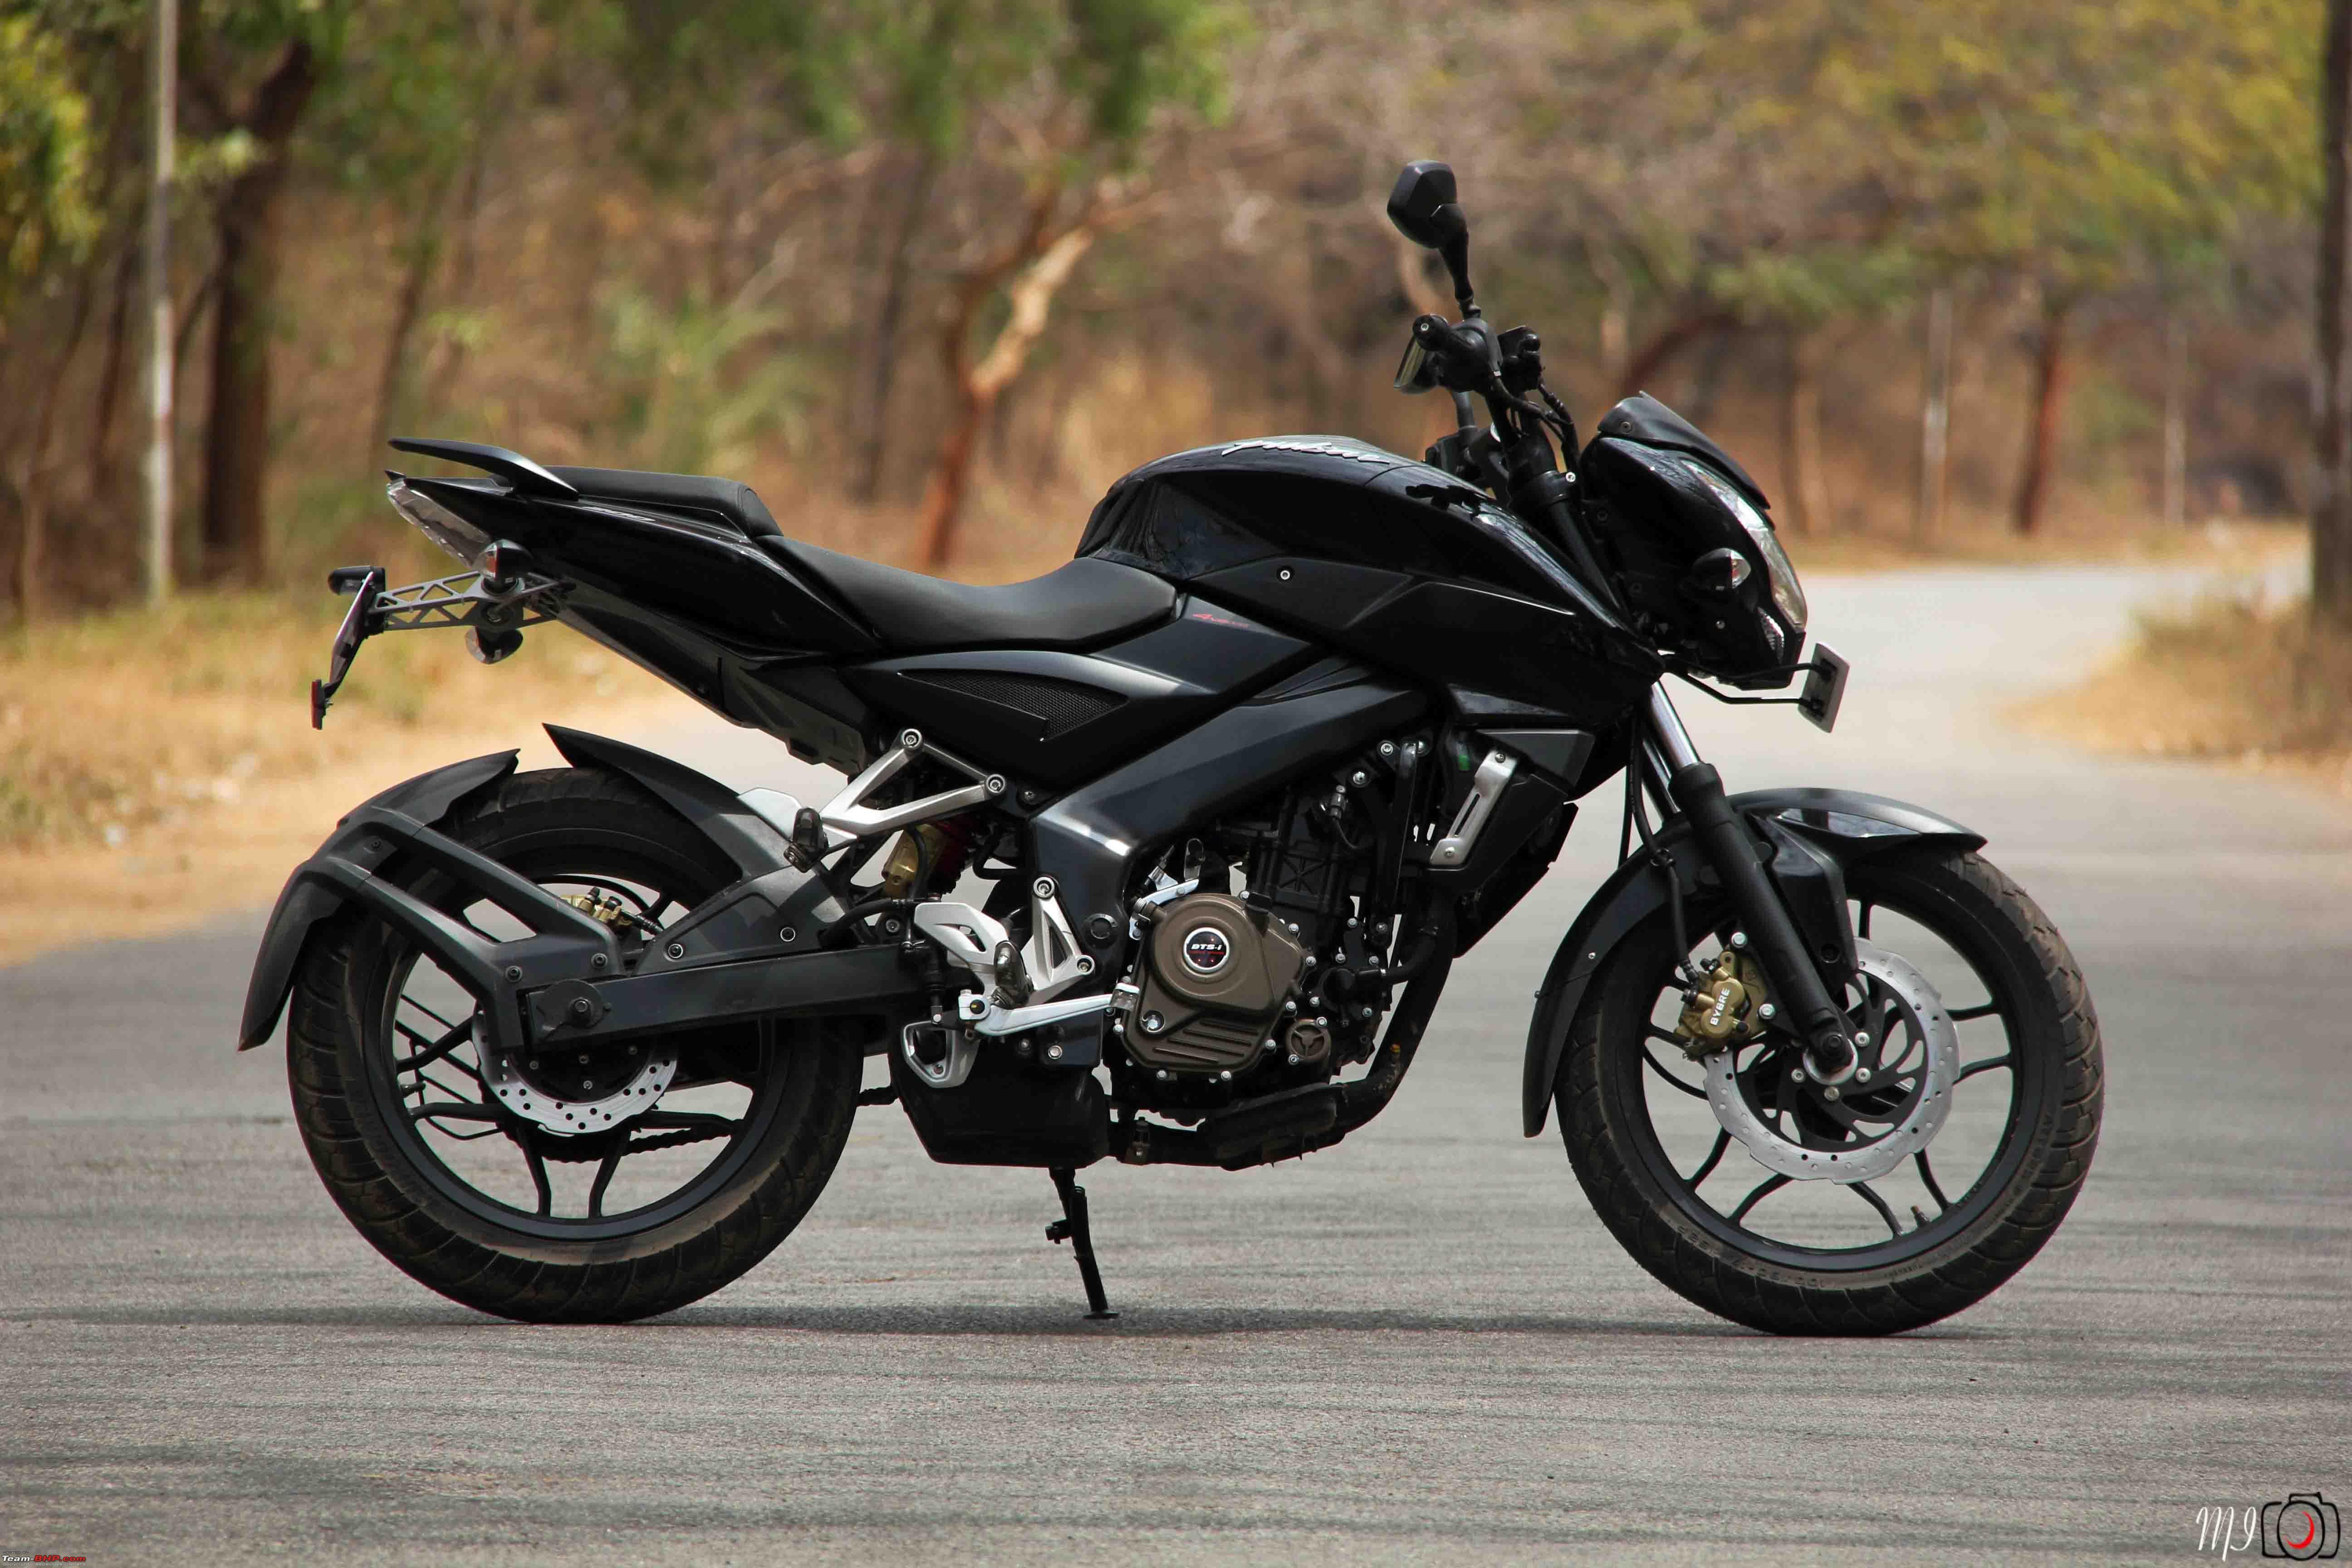 2017 Bajaj Pulsar NS200 First Ride Review - NDTV CarAndBike